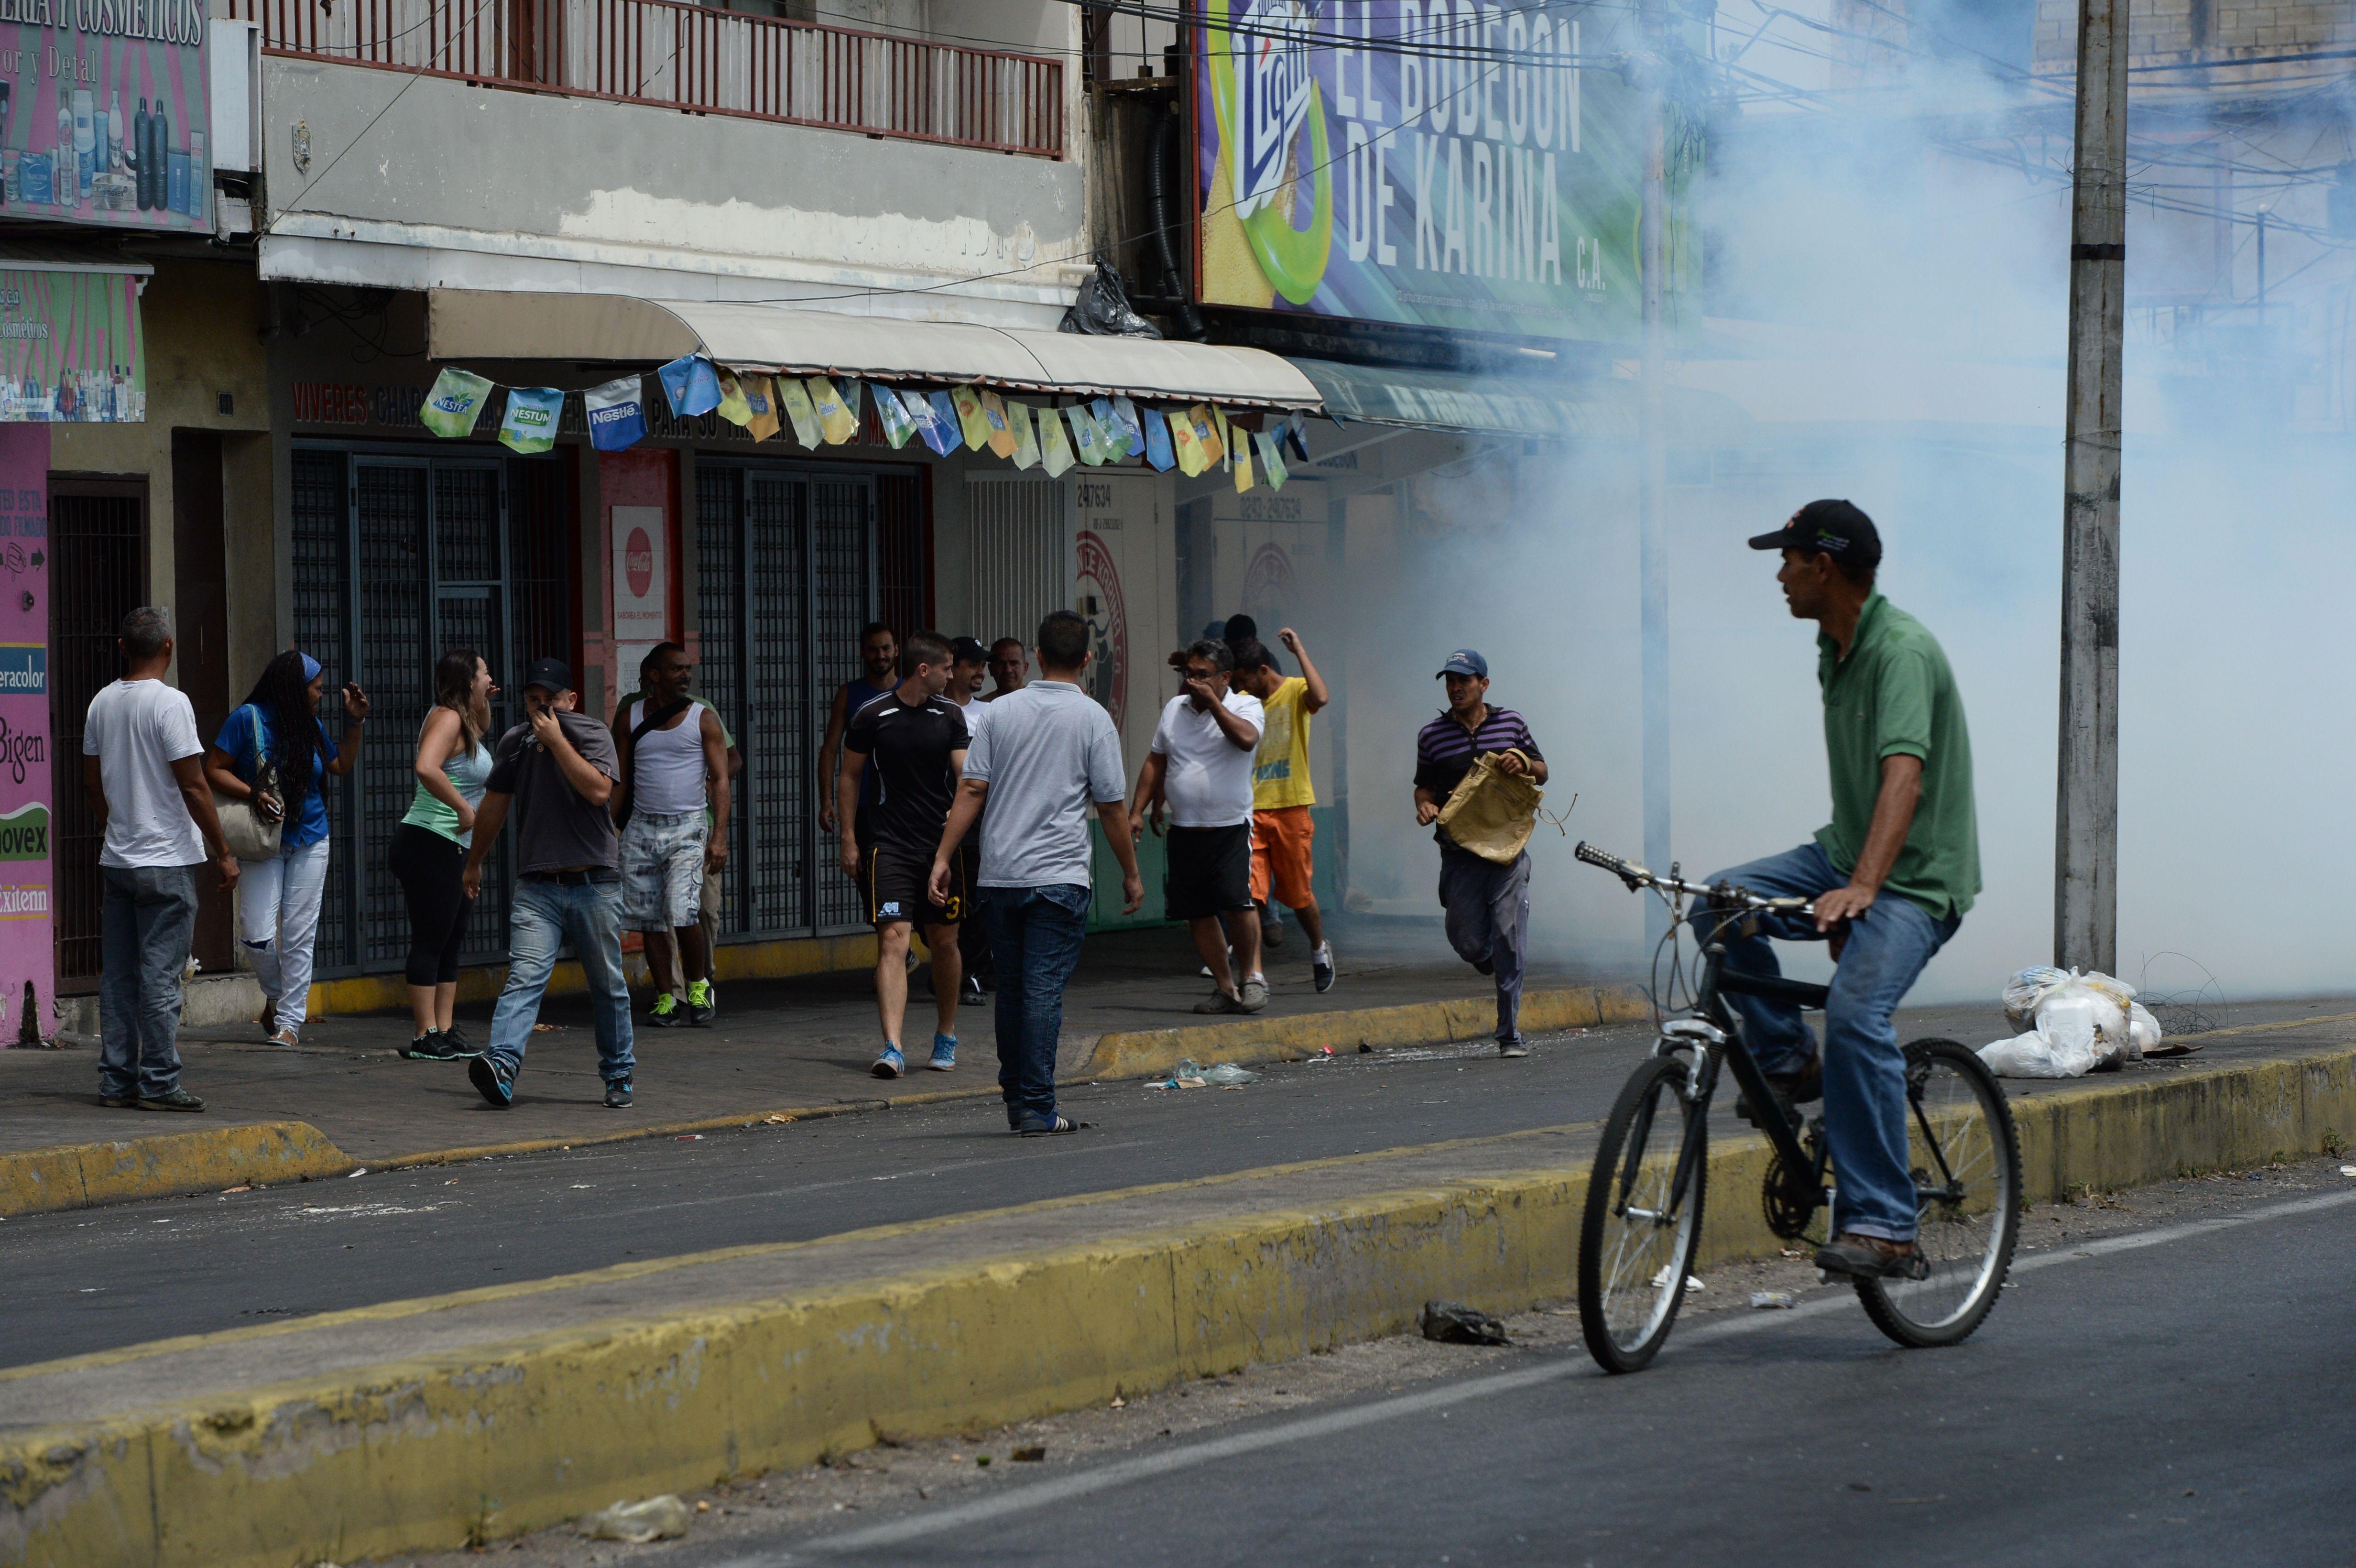 VENEZUELA-CRISIS-LOOTING